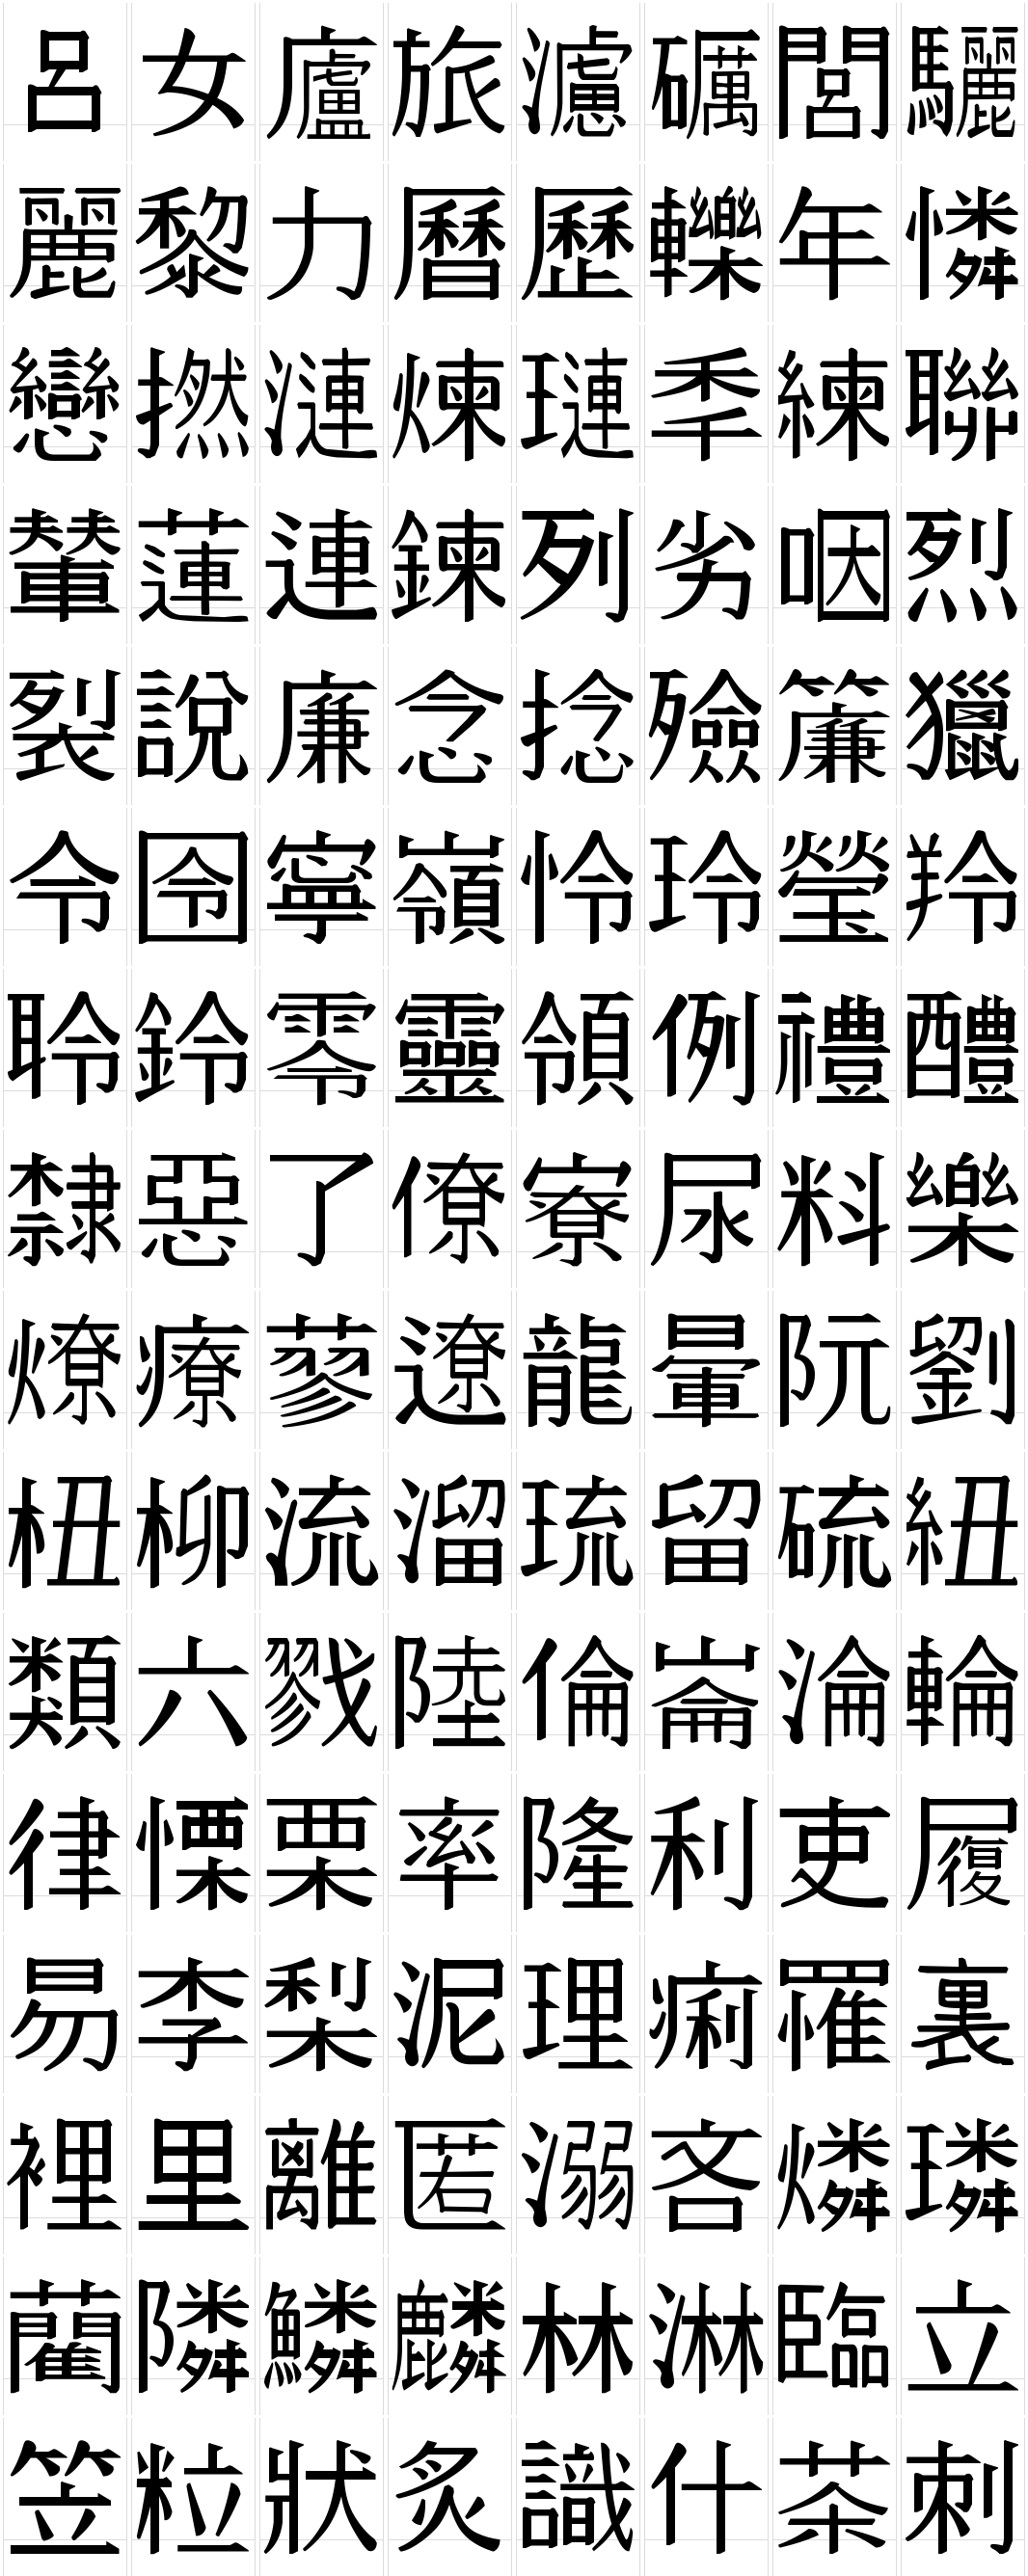 Chinese ideograms symbols pinterest chinese ideograms buycottarizona